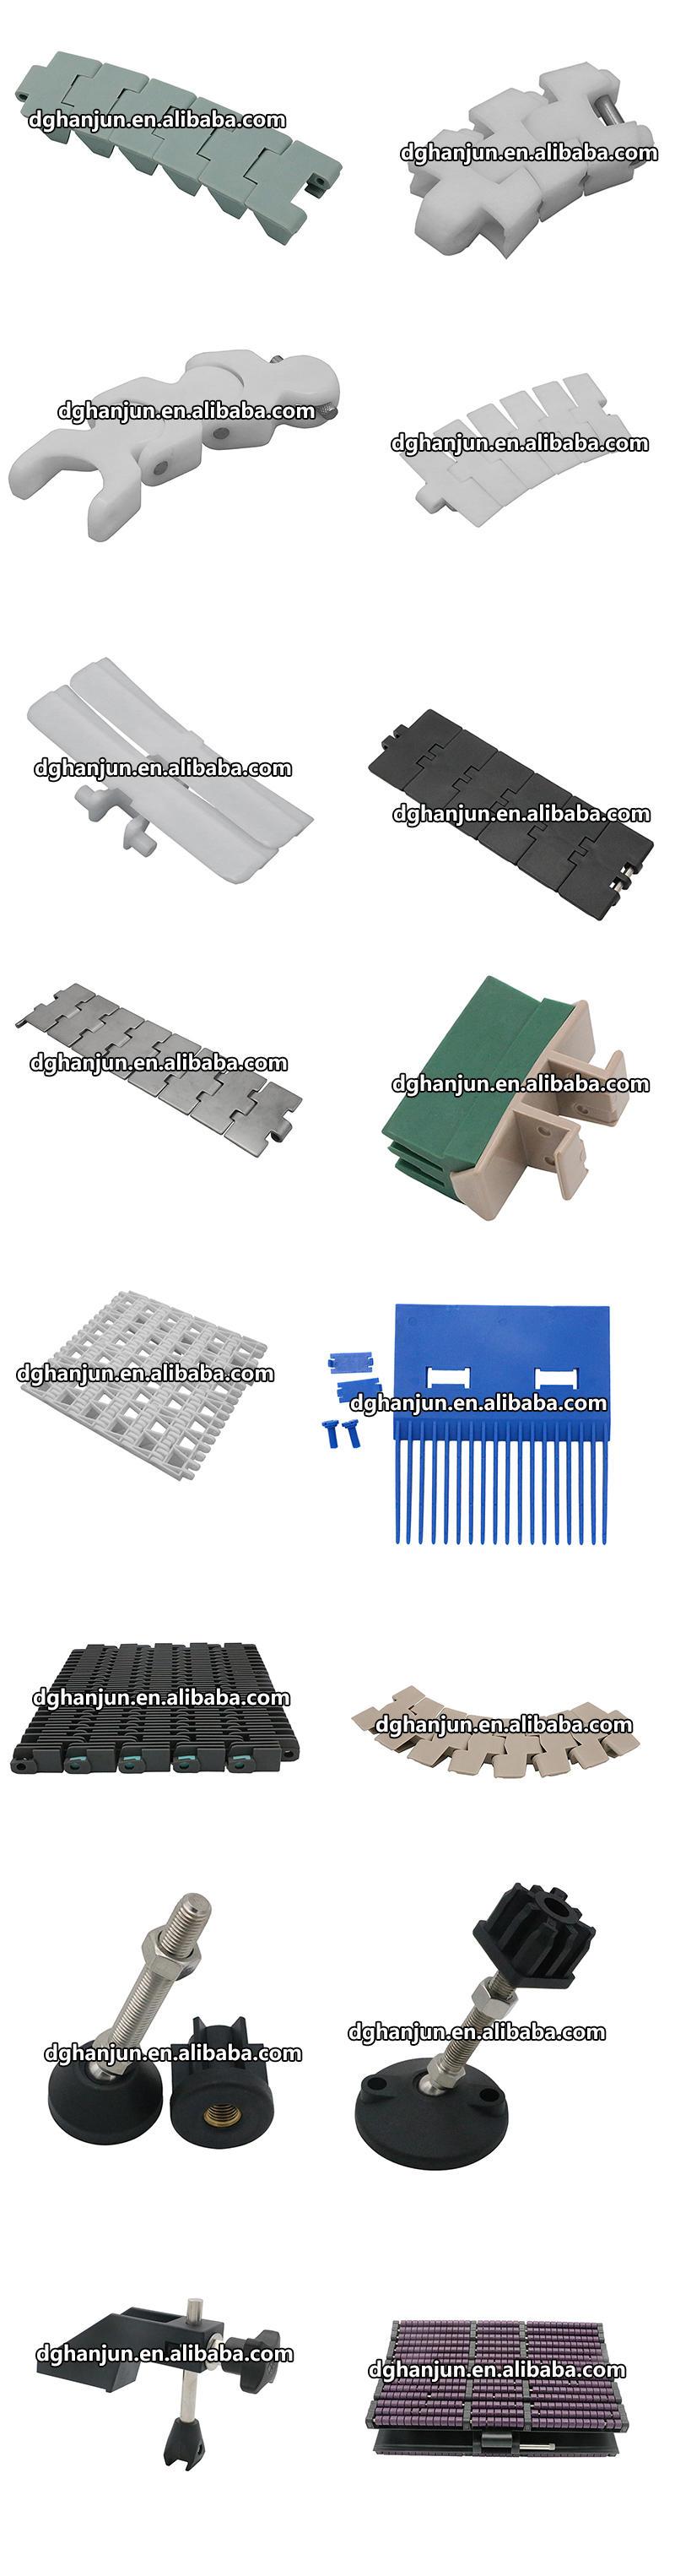 DHP heavy duty conveyor components co wholesale for conveyor machine